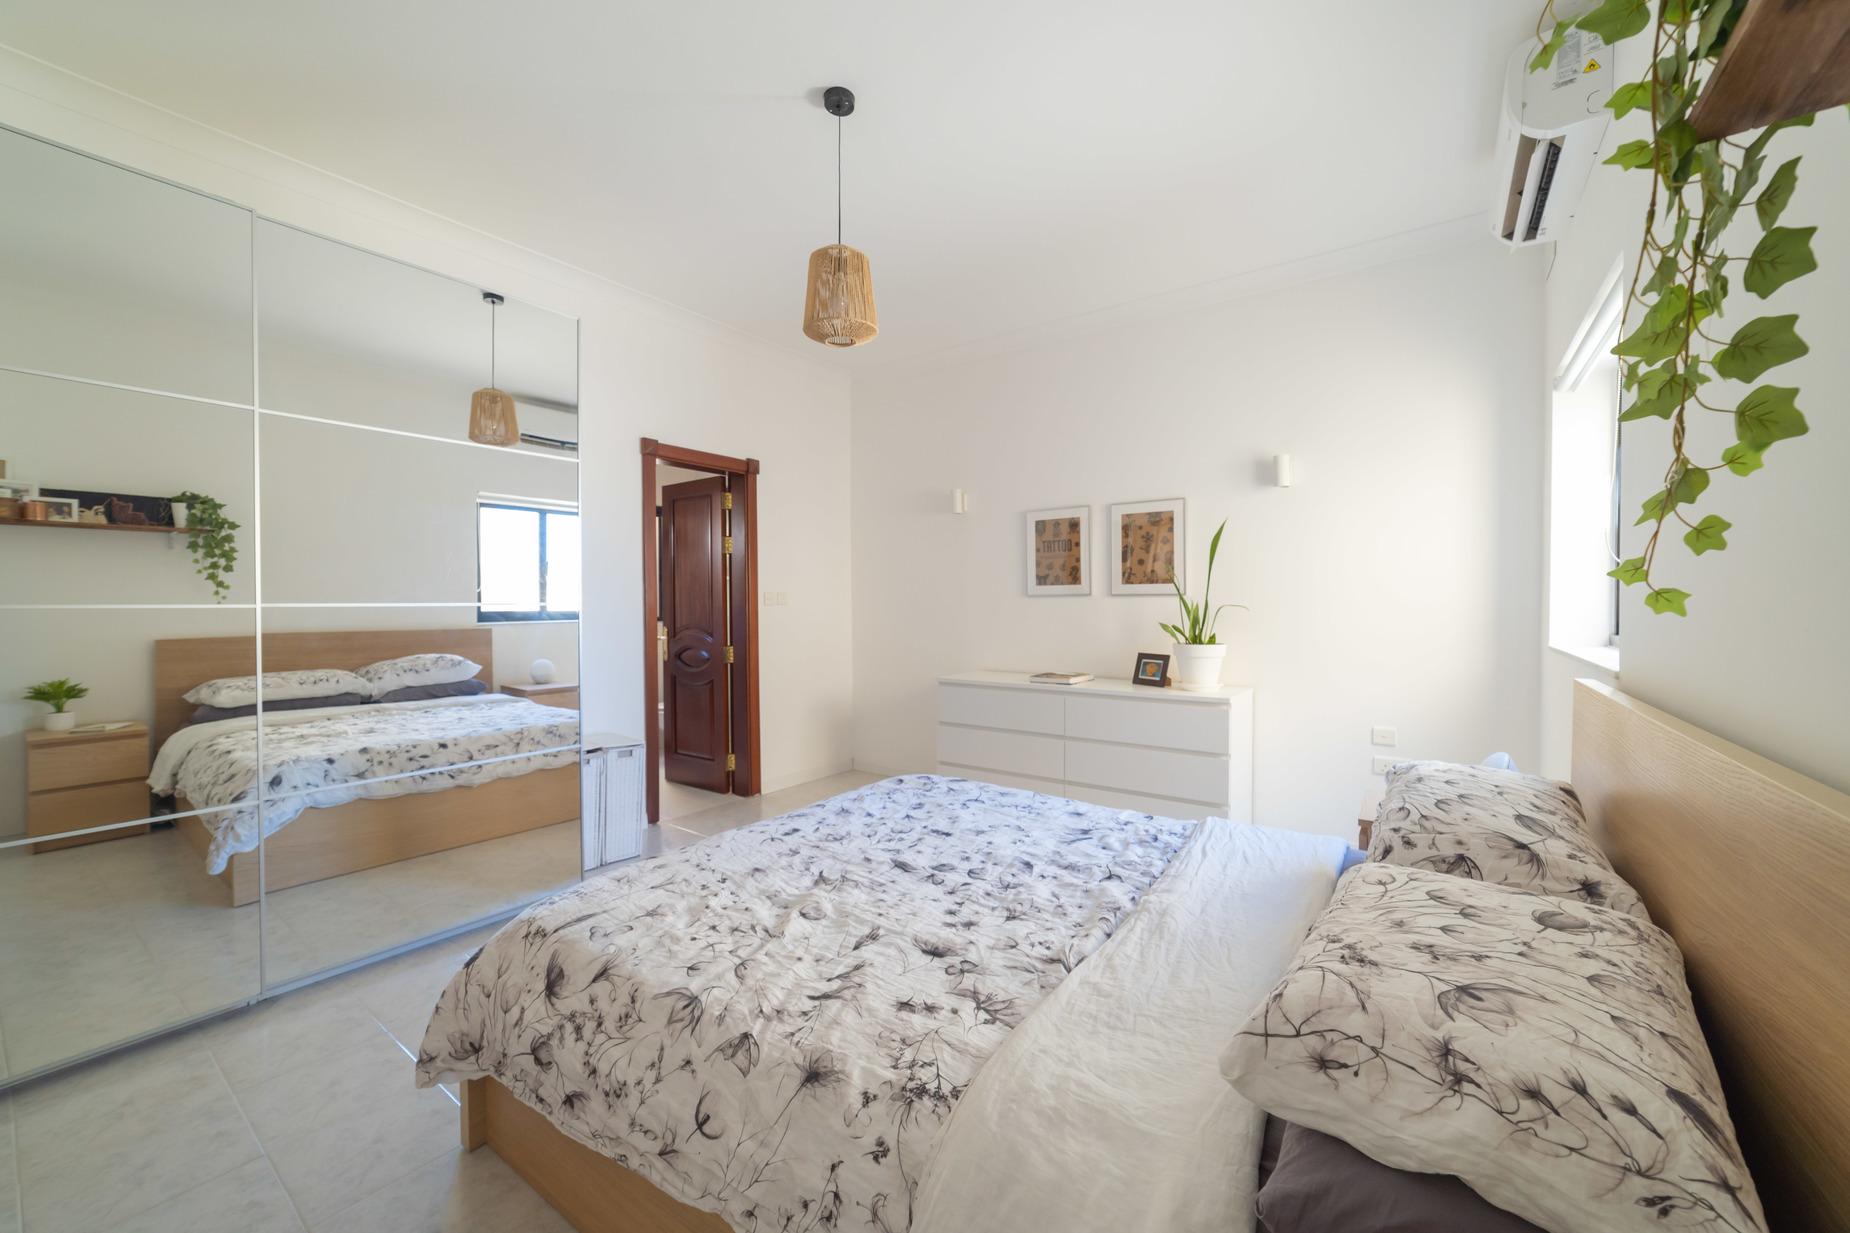 3 bed Apartment For Sale in Naxxar, Naxxar - thumb 11